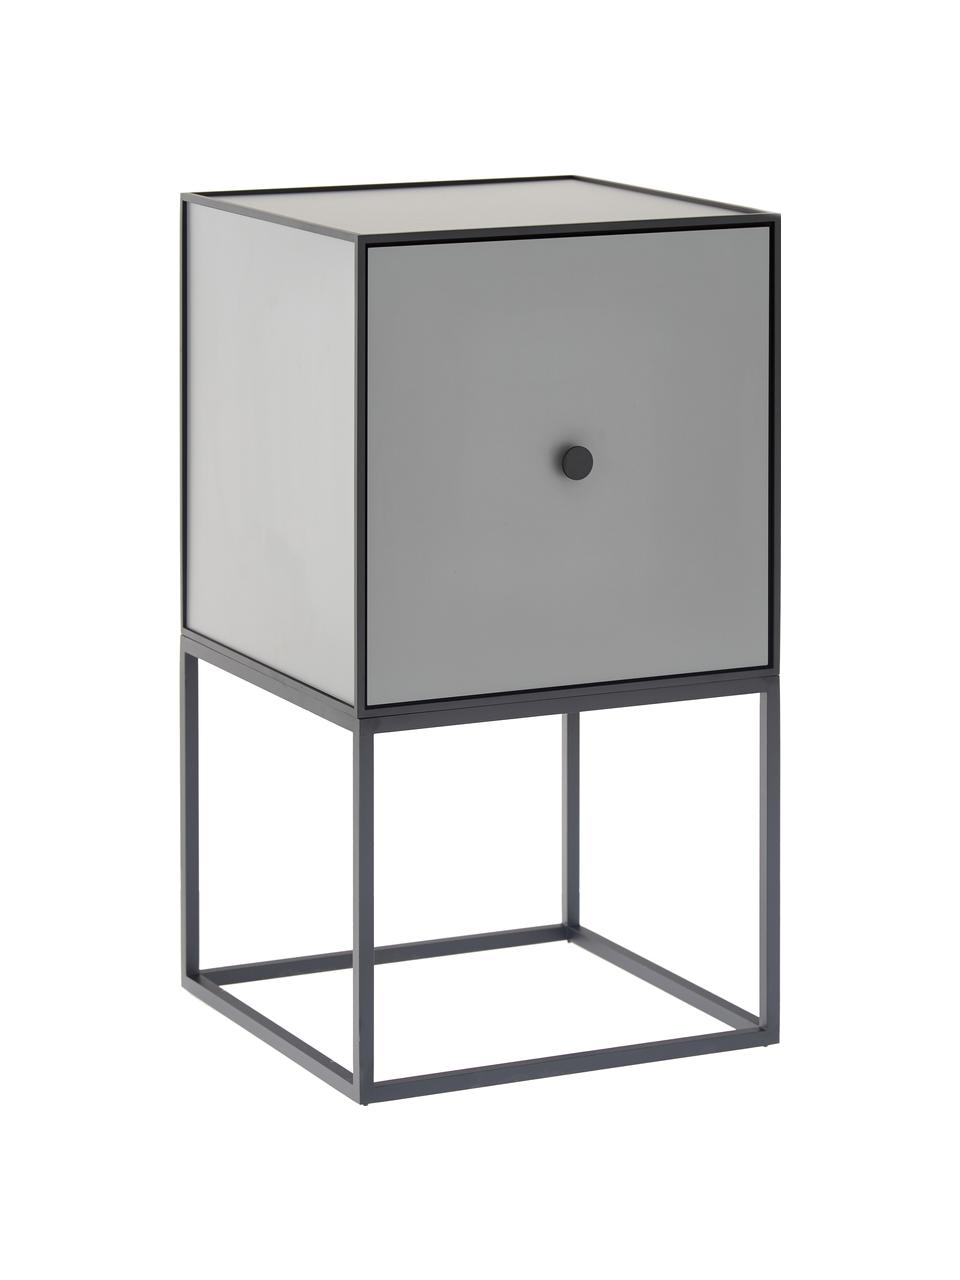 Mesilla de noche de diseño Frame, Cuerpo: tablero de fibras de dens, Negro, gris oscuro, An 35 x Al 63 cm